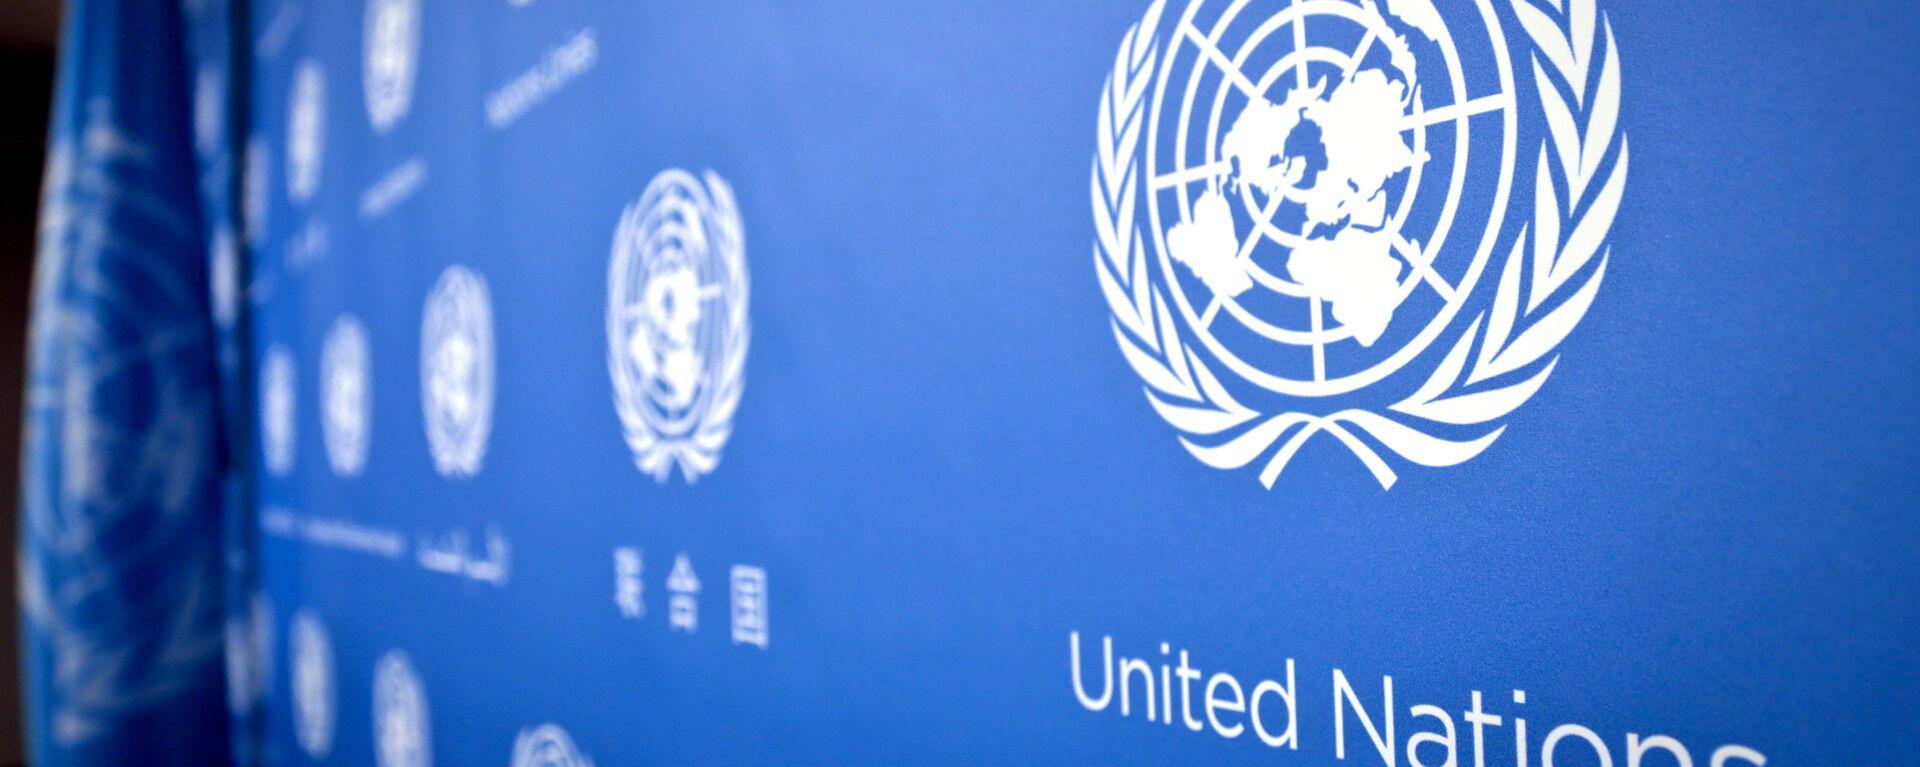 Logo de la ONU - Sputnik Mundo, 1920, 18.03.2021